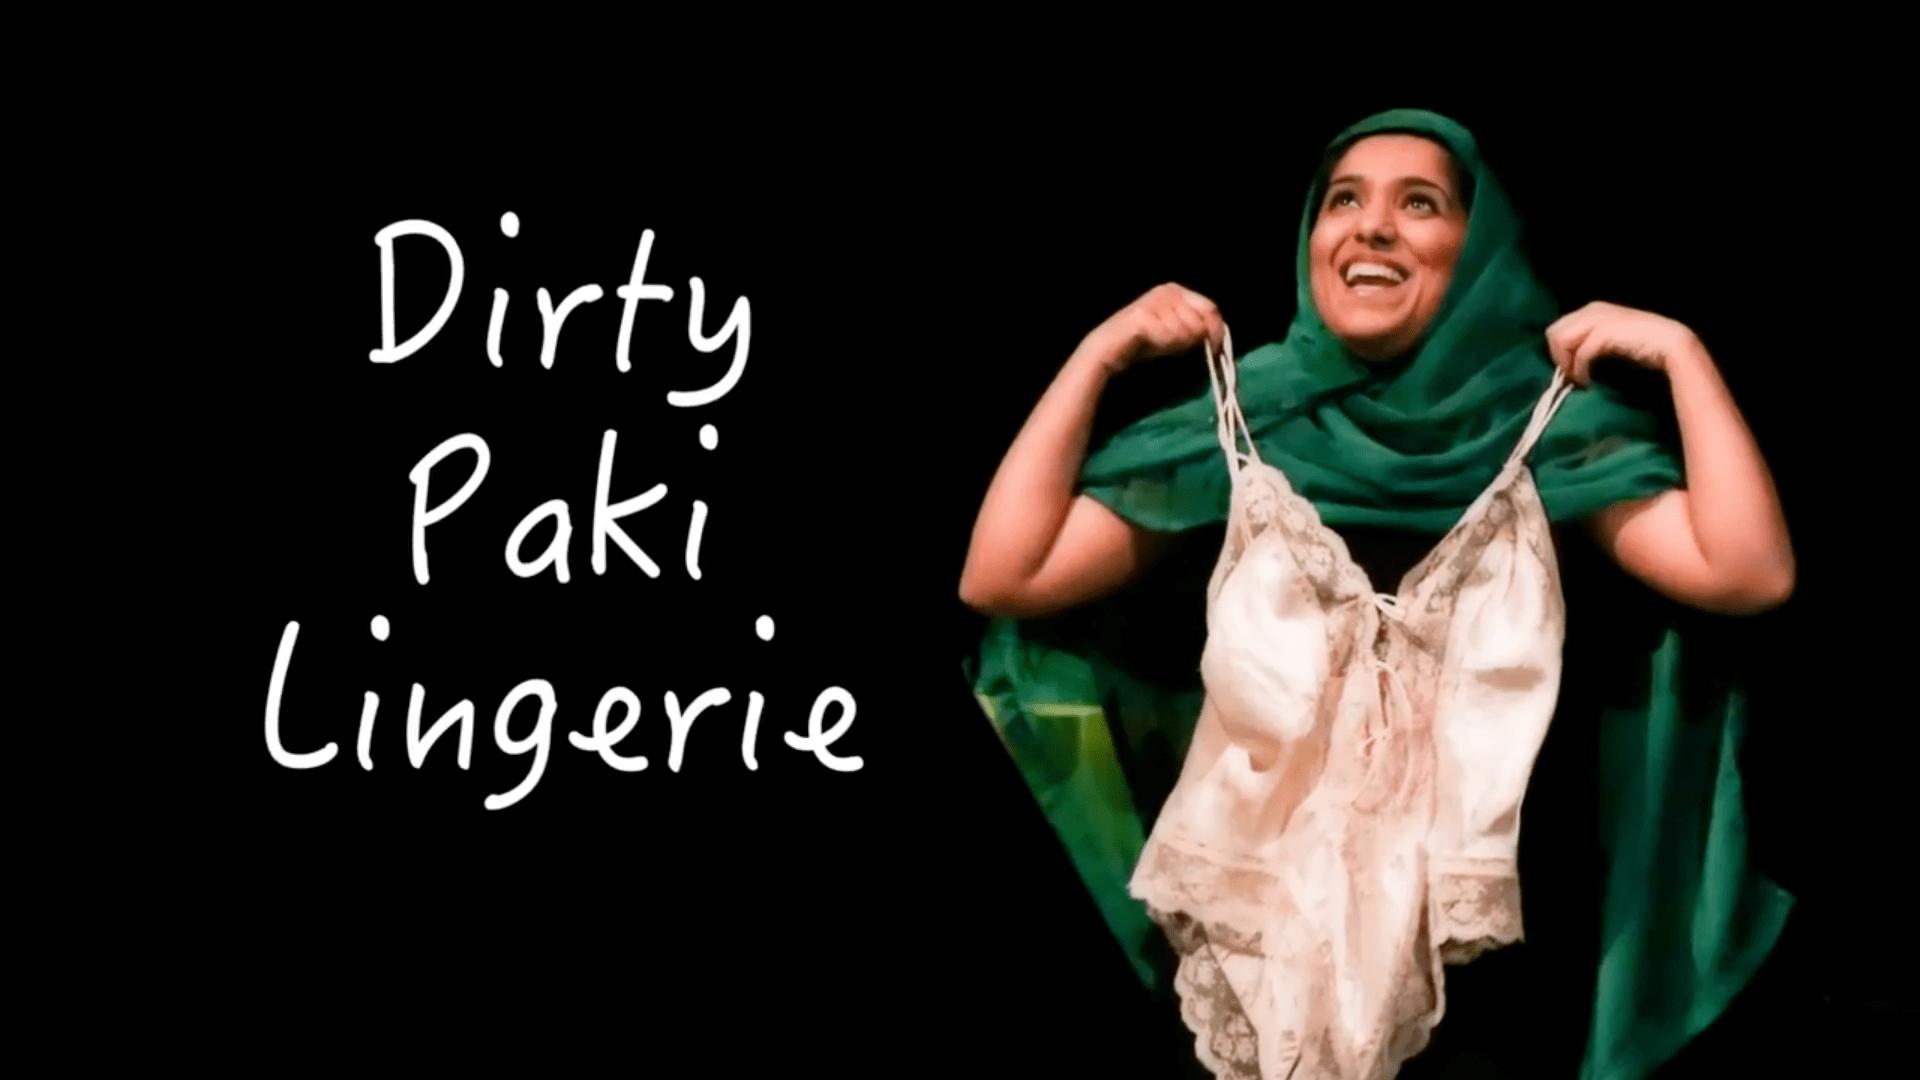 Dirty Paki Lingerie Trailer